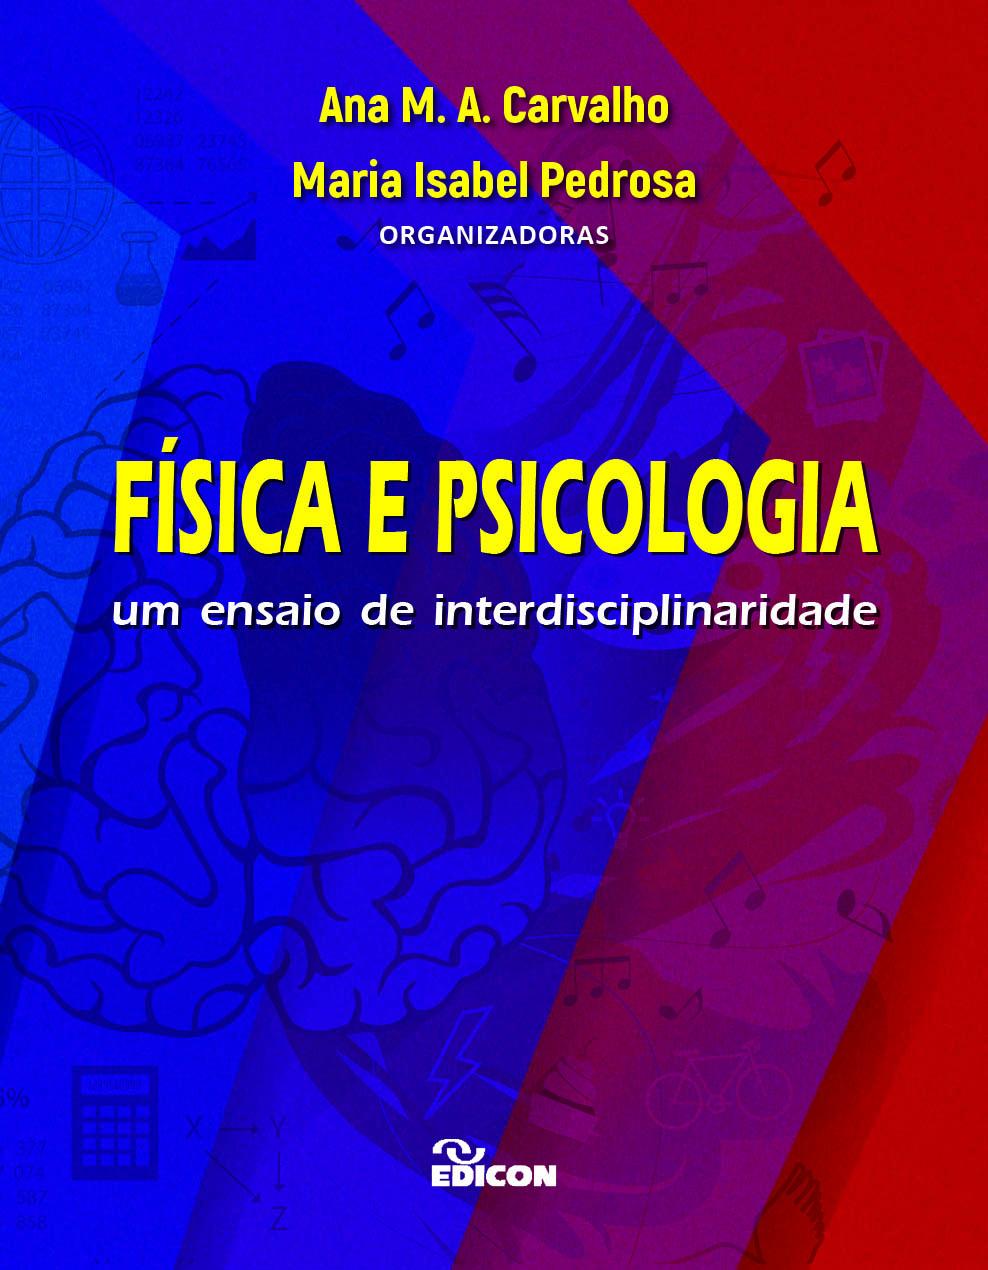 Física e psicologia: um ensaio de interdisciplinaridade